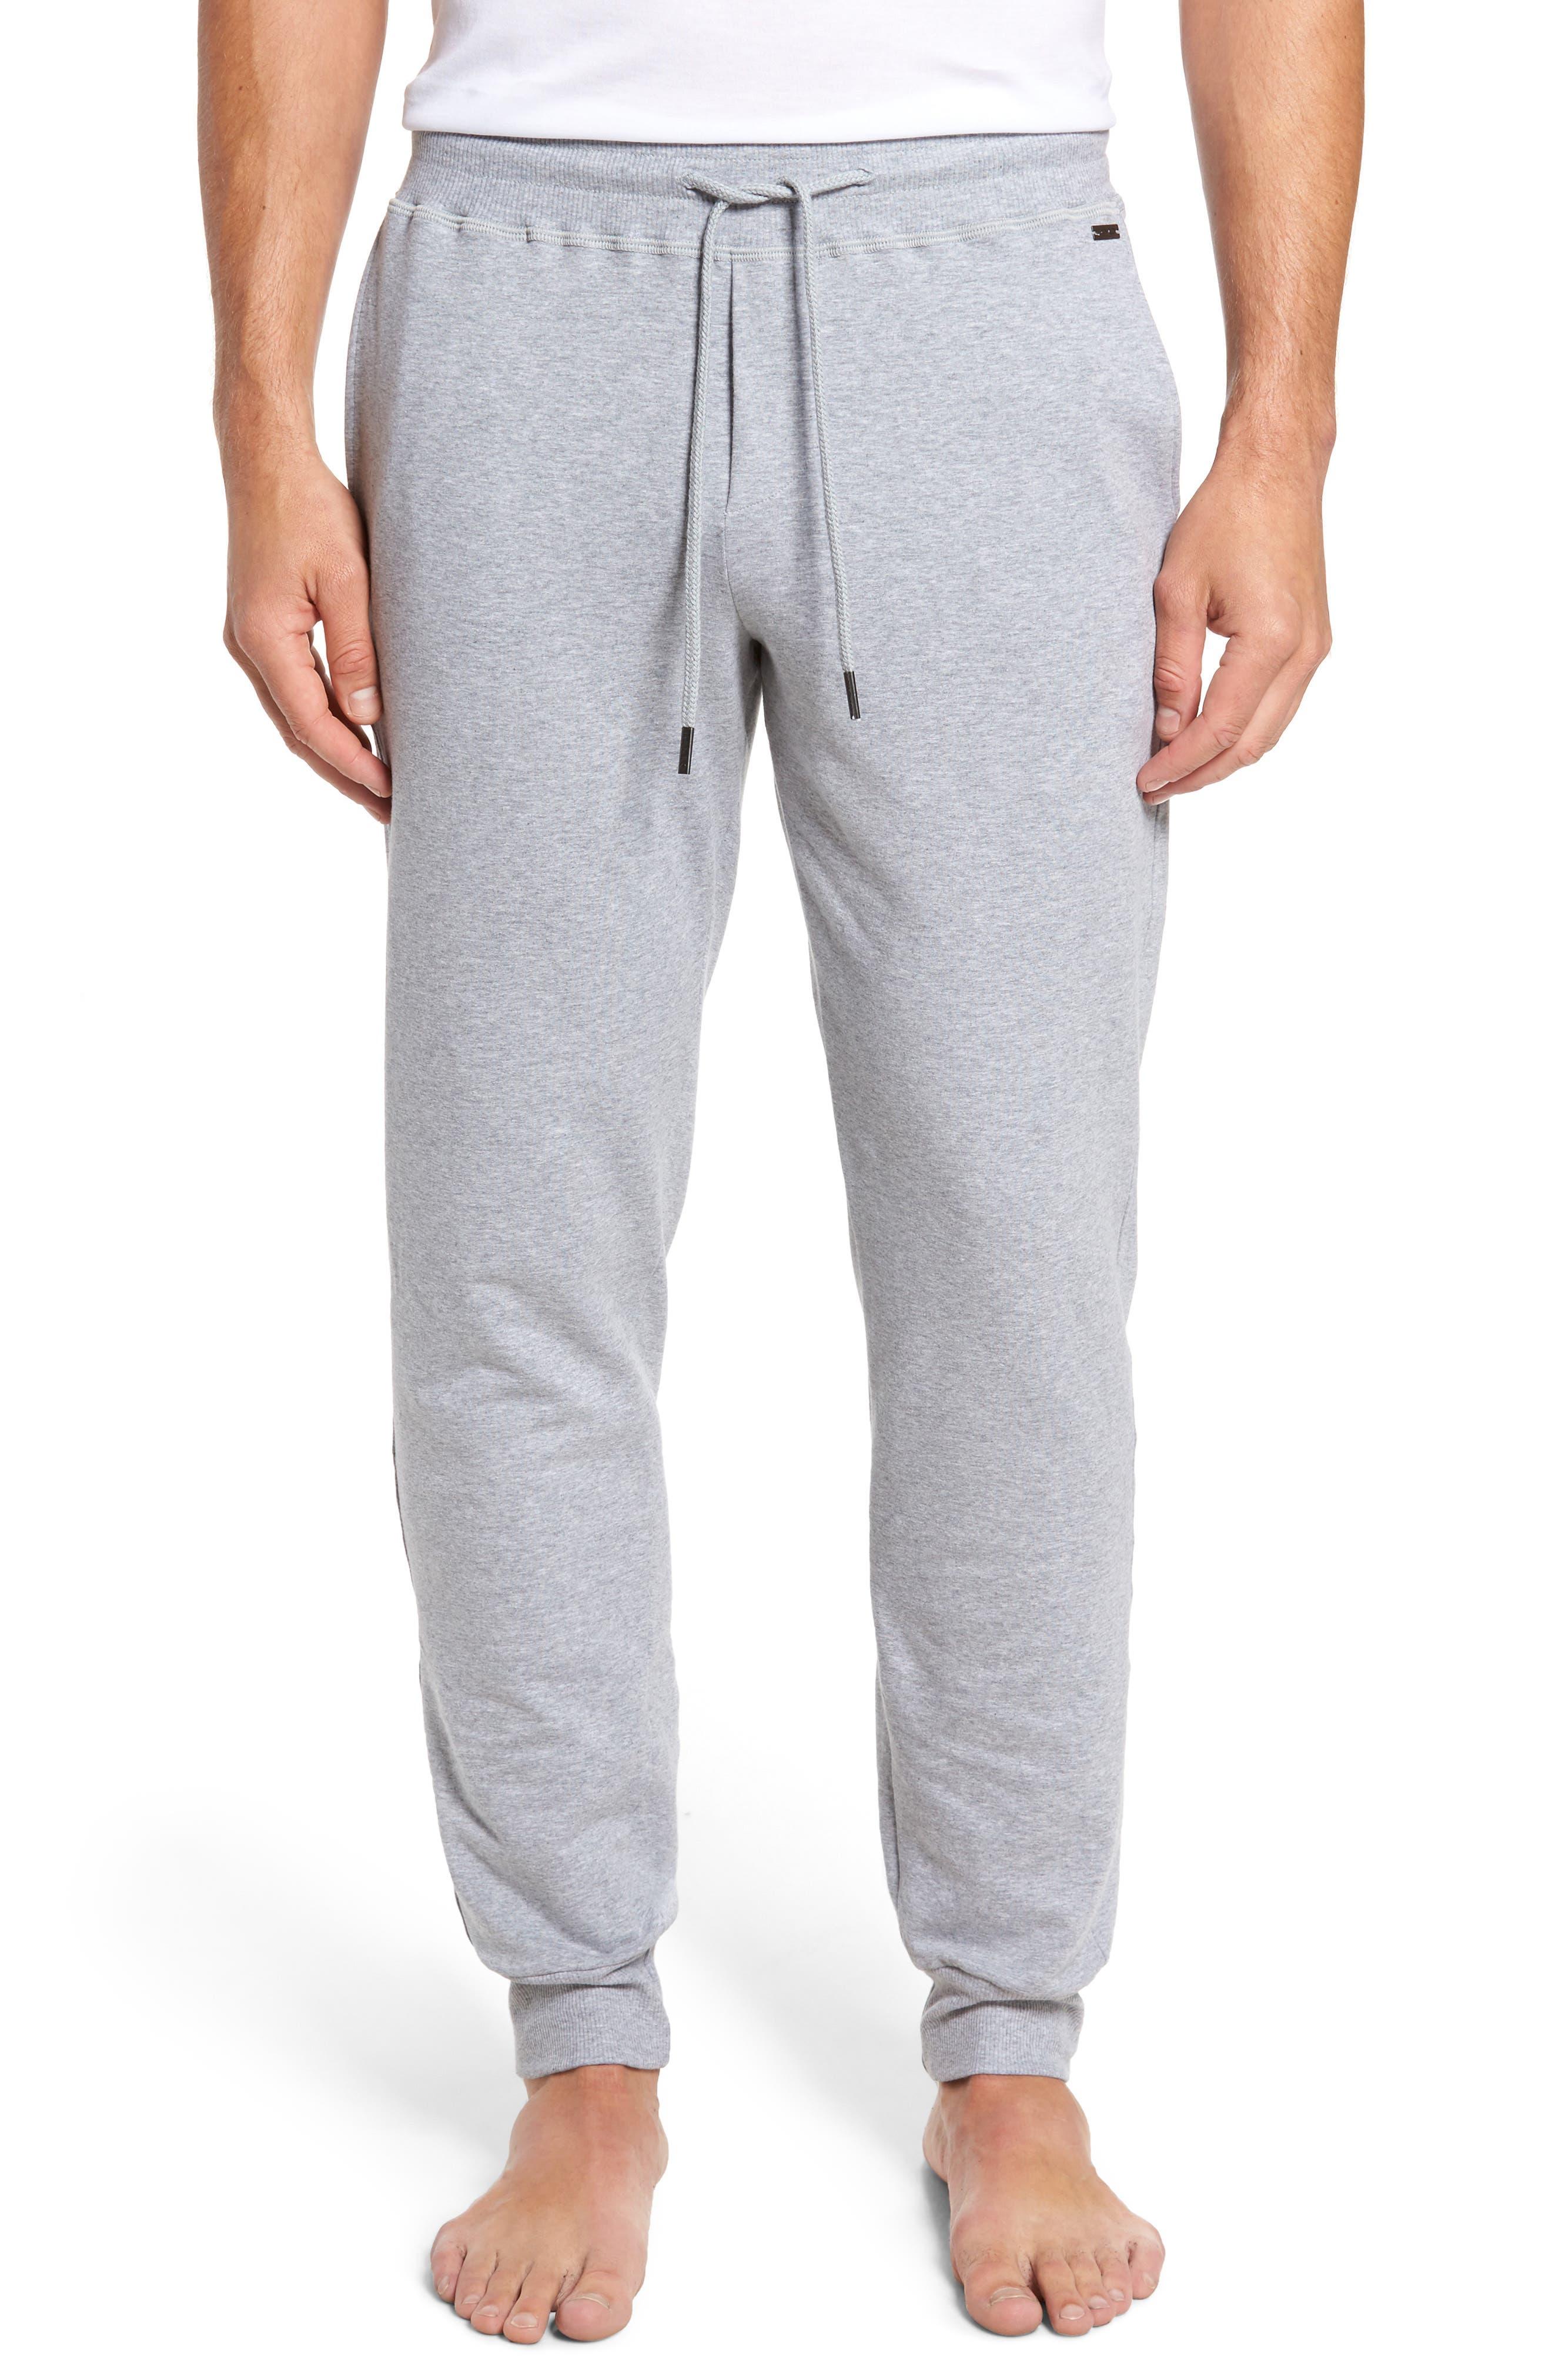 Living Lounge Pants,                         Main,                         color, GREY MELANGE